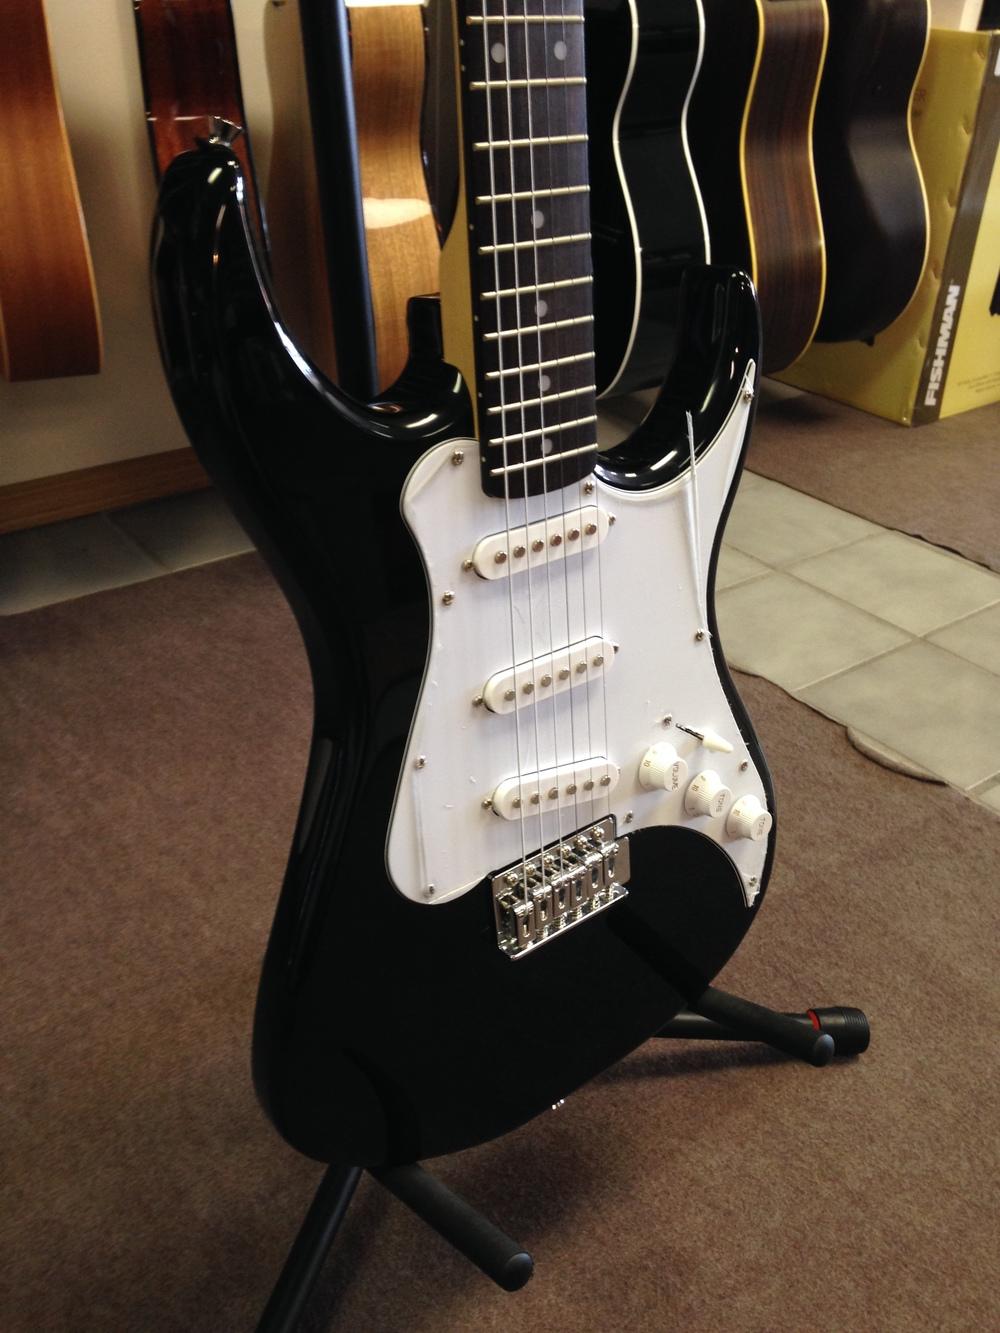 AS-750 - $150